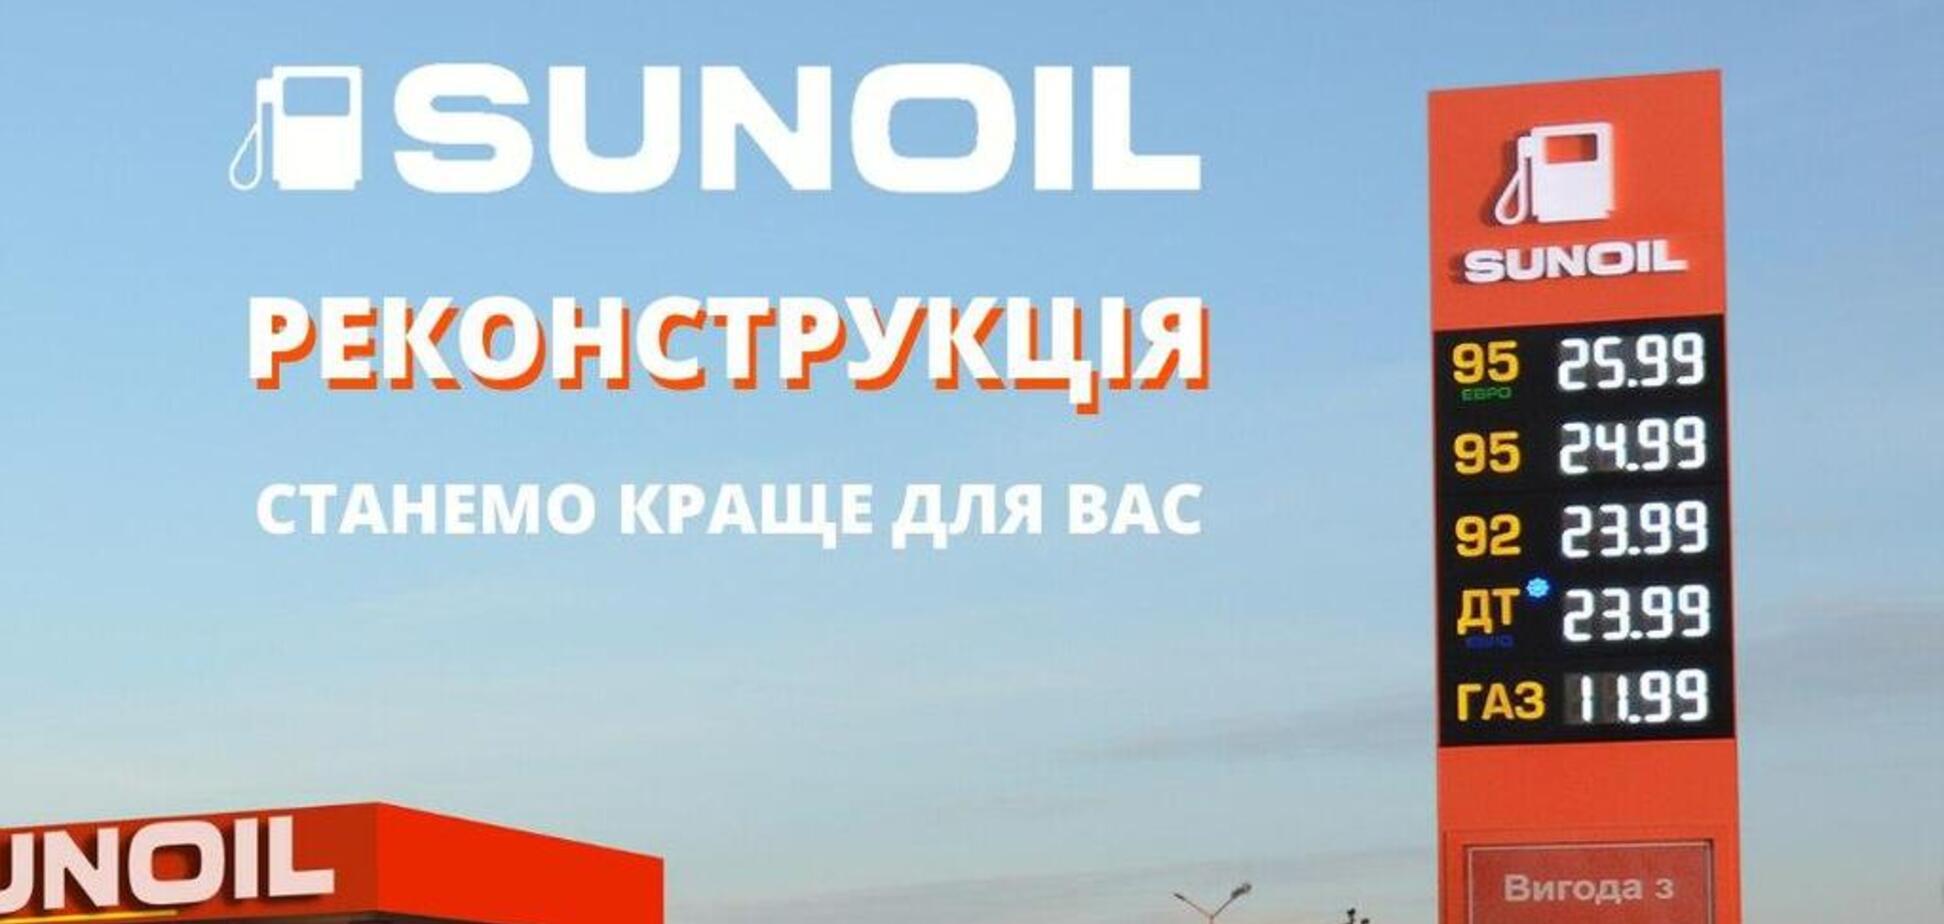 Мережа автозаправок SUNOIL оголосила масштабну реконструкцію